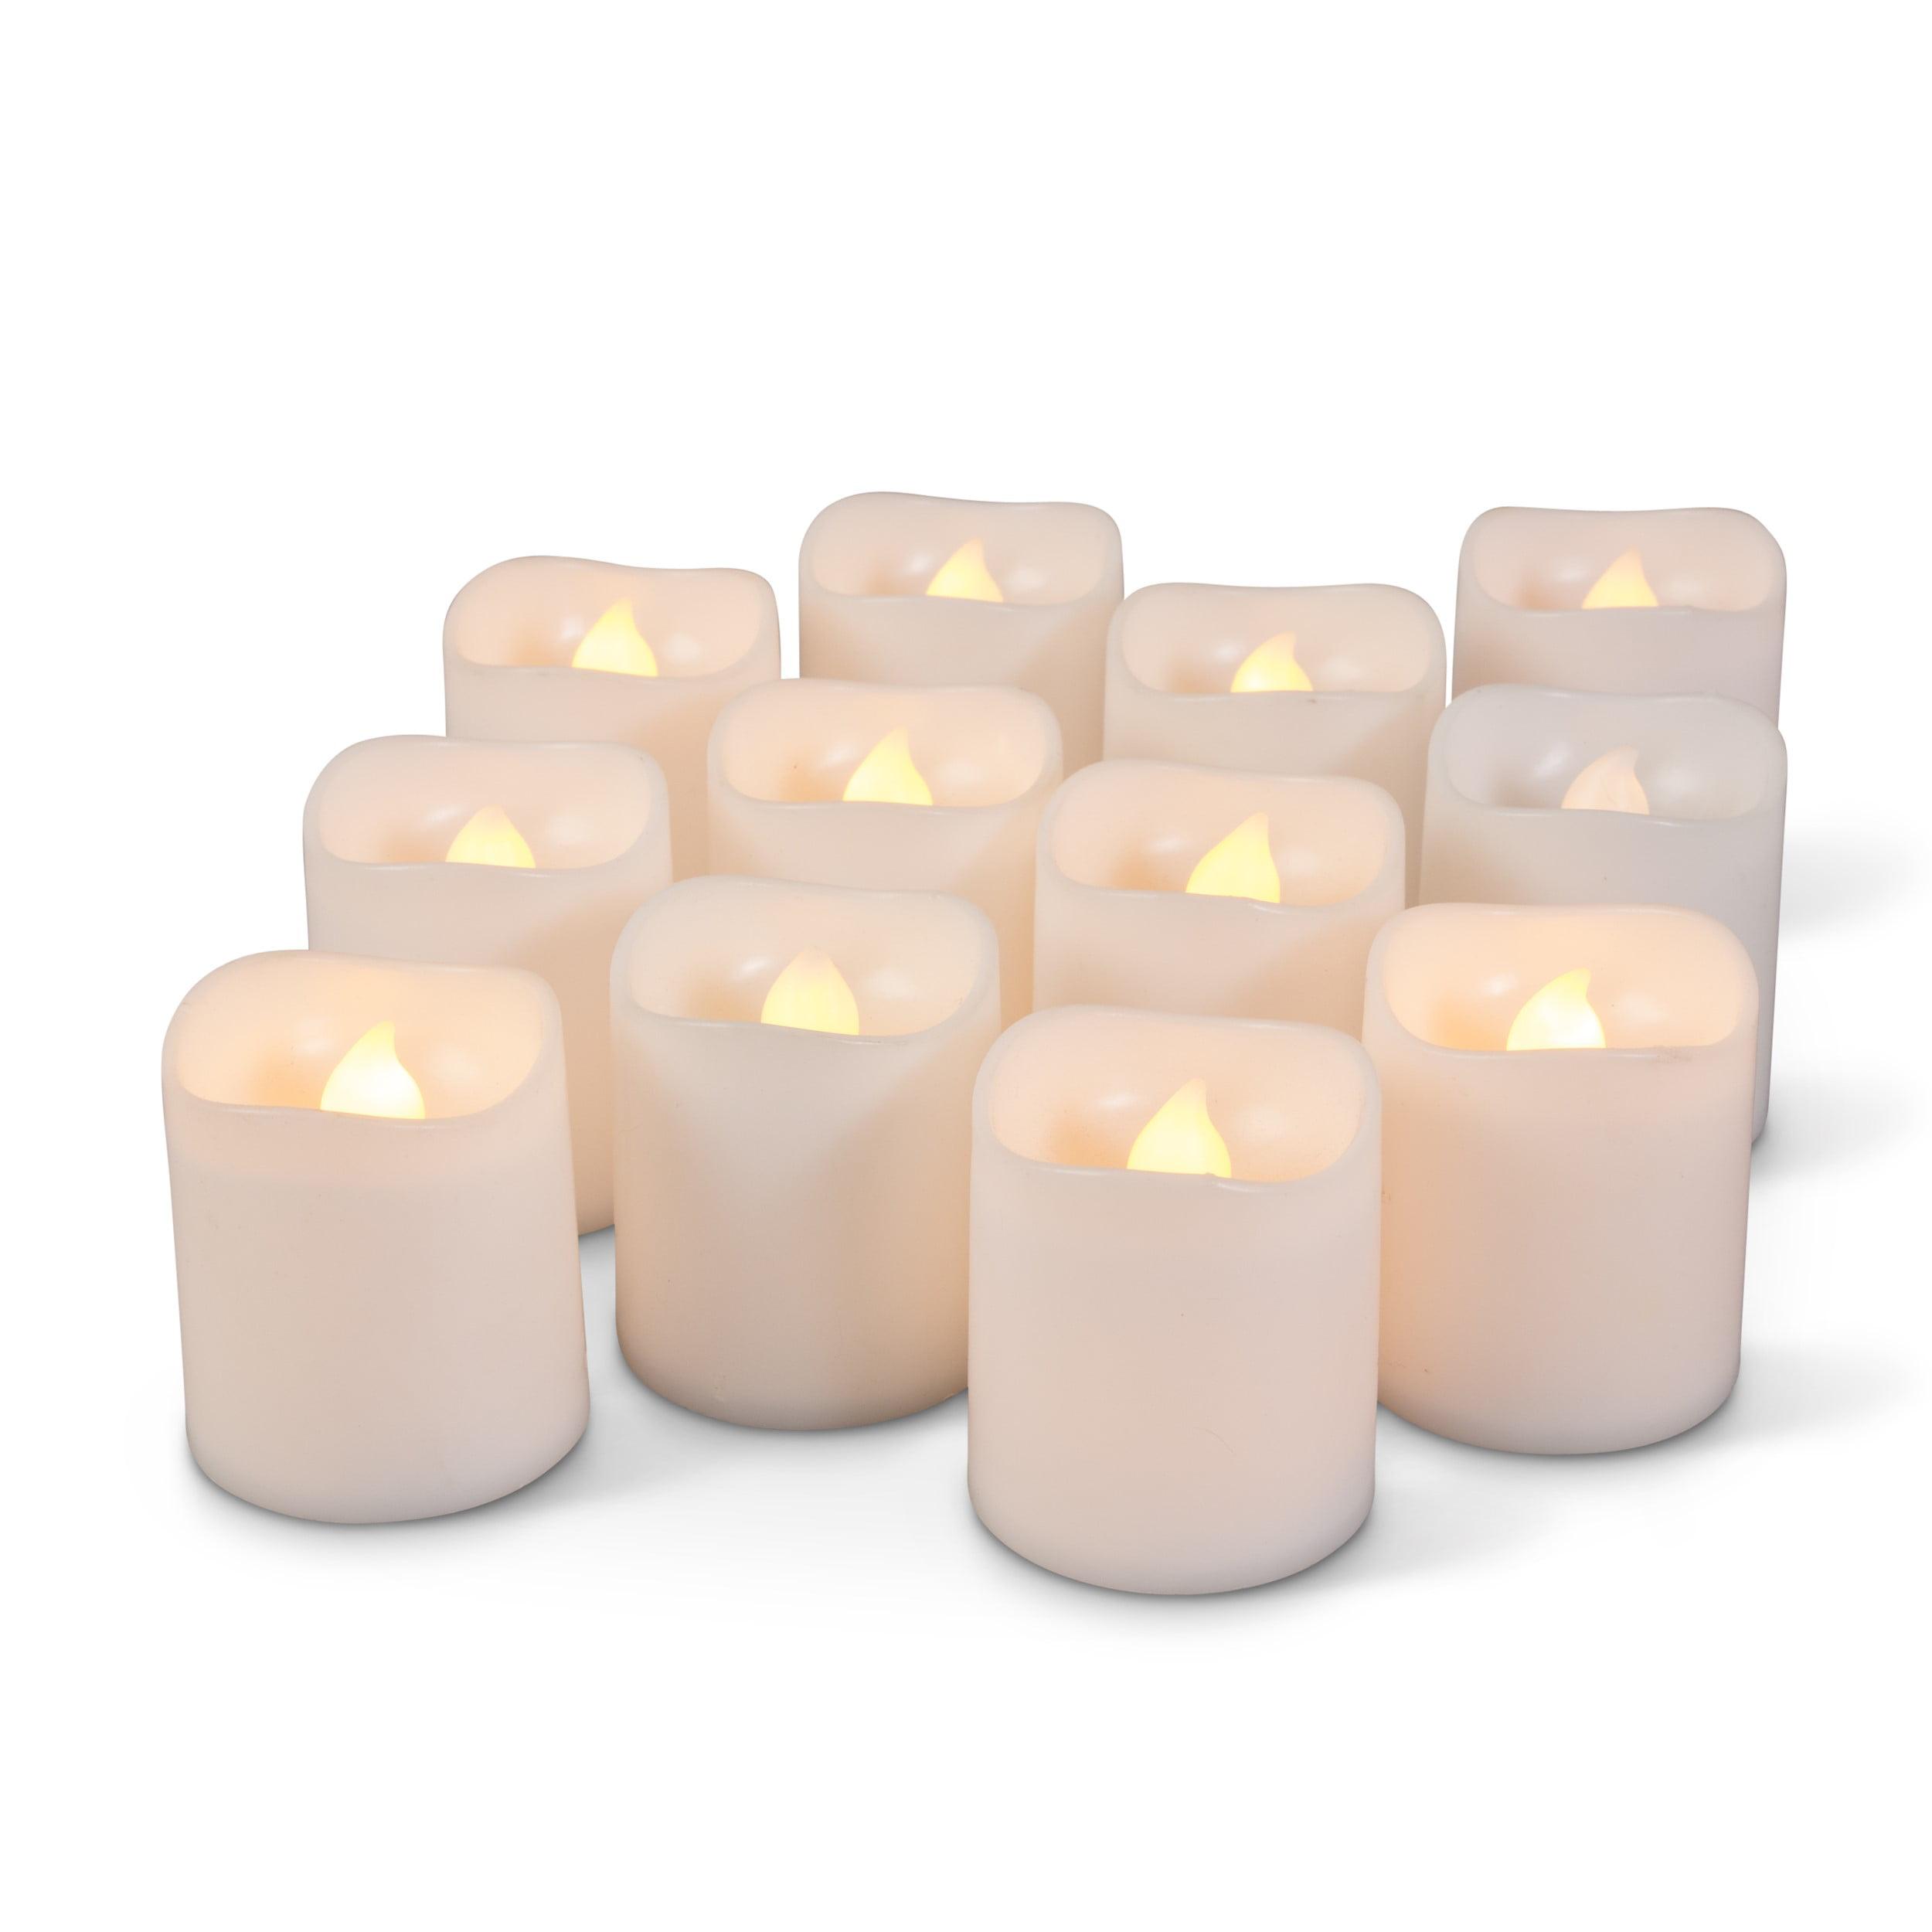 Everlasting Glow Wavy Edge LED Votive Candle with Flicker (Set of 12), White